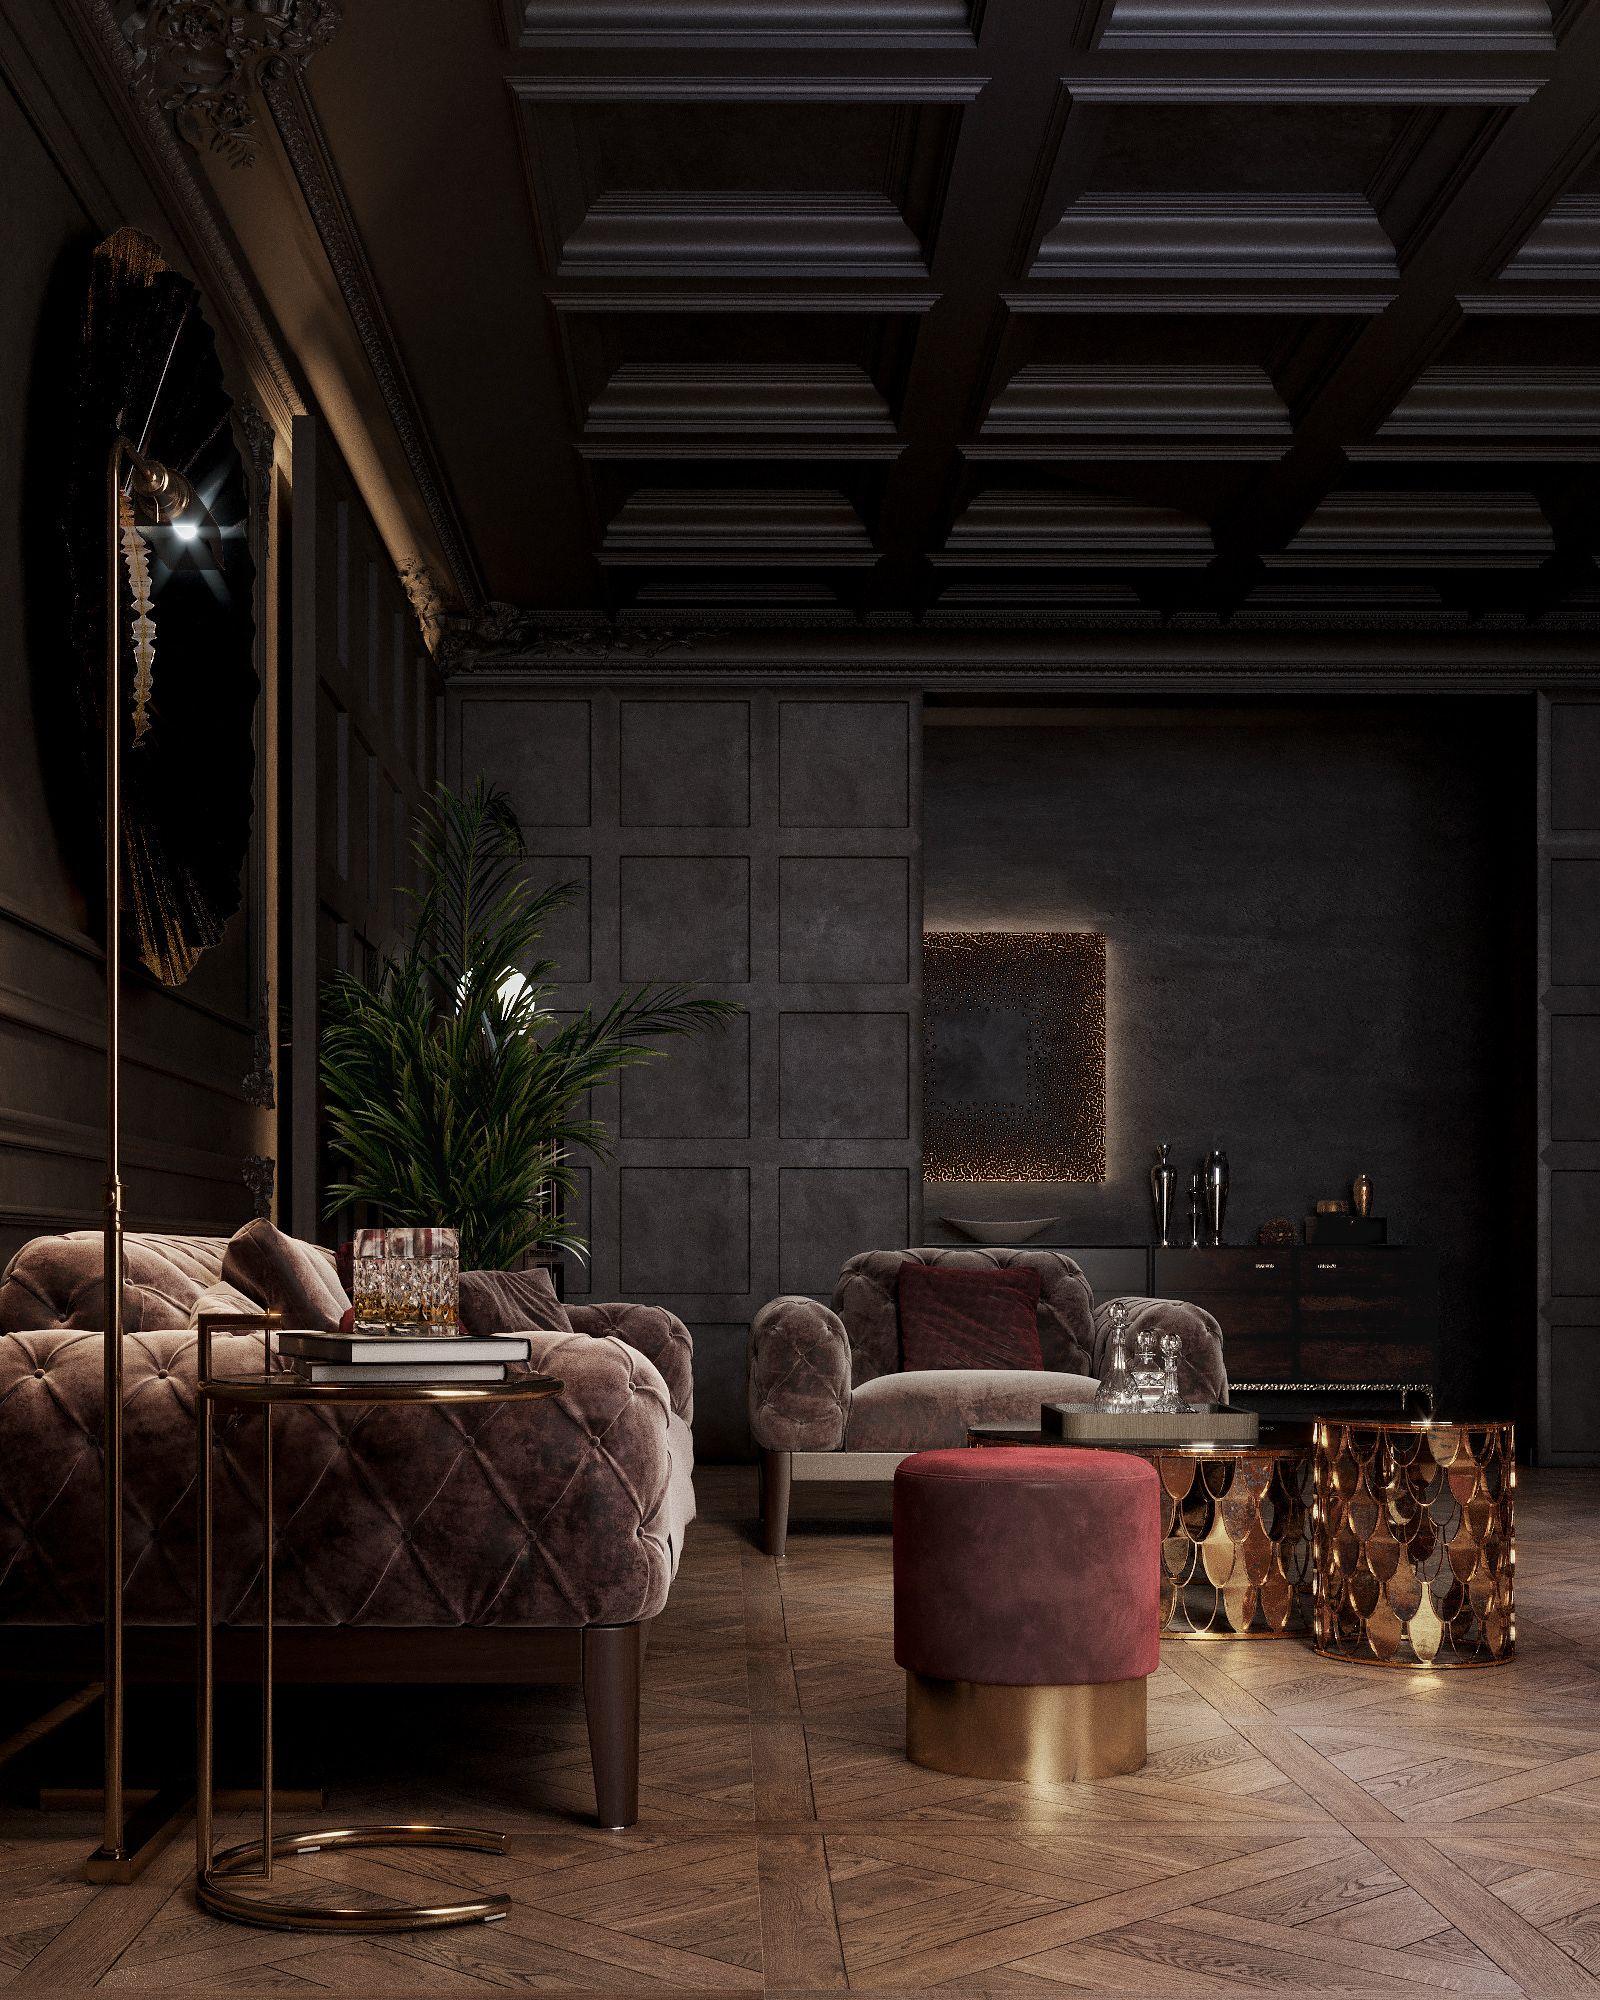 Classic Dark Apartment On Behance Dark Interior Design Luxury Home Decor Luxury Interior Design